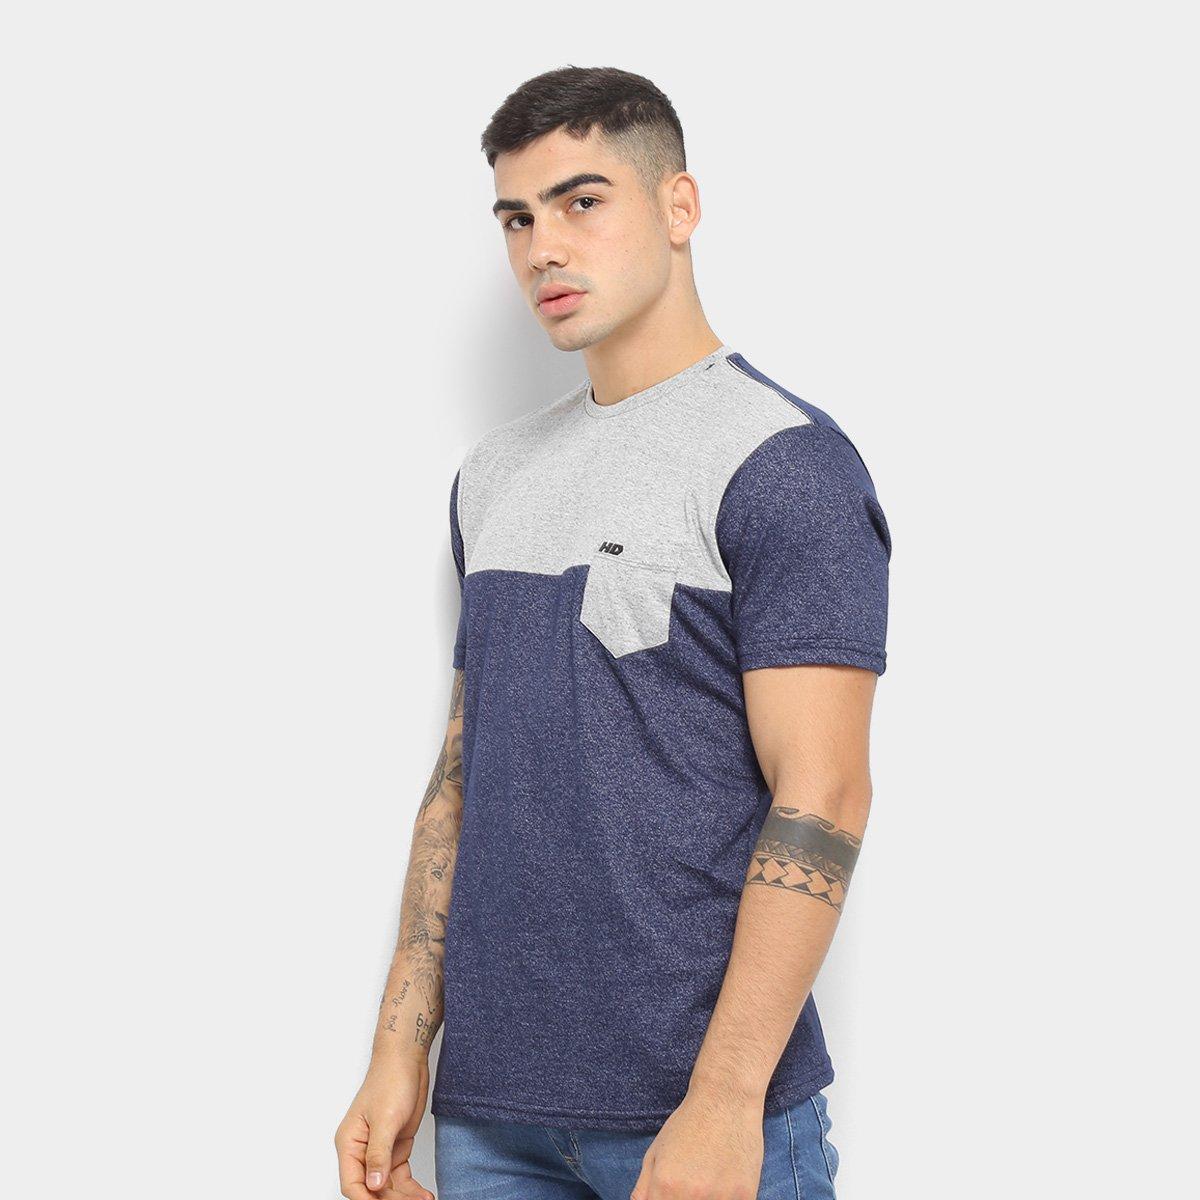 Camiseta HD Inverted Blocks Masculina